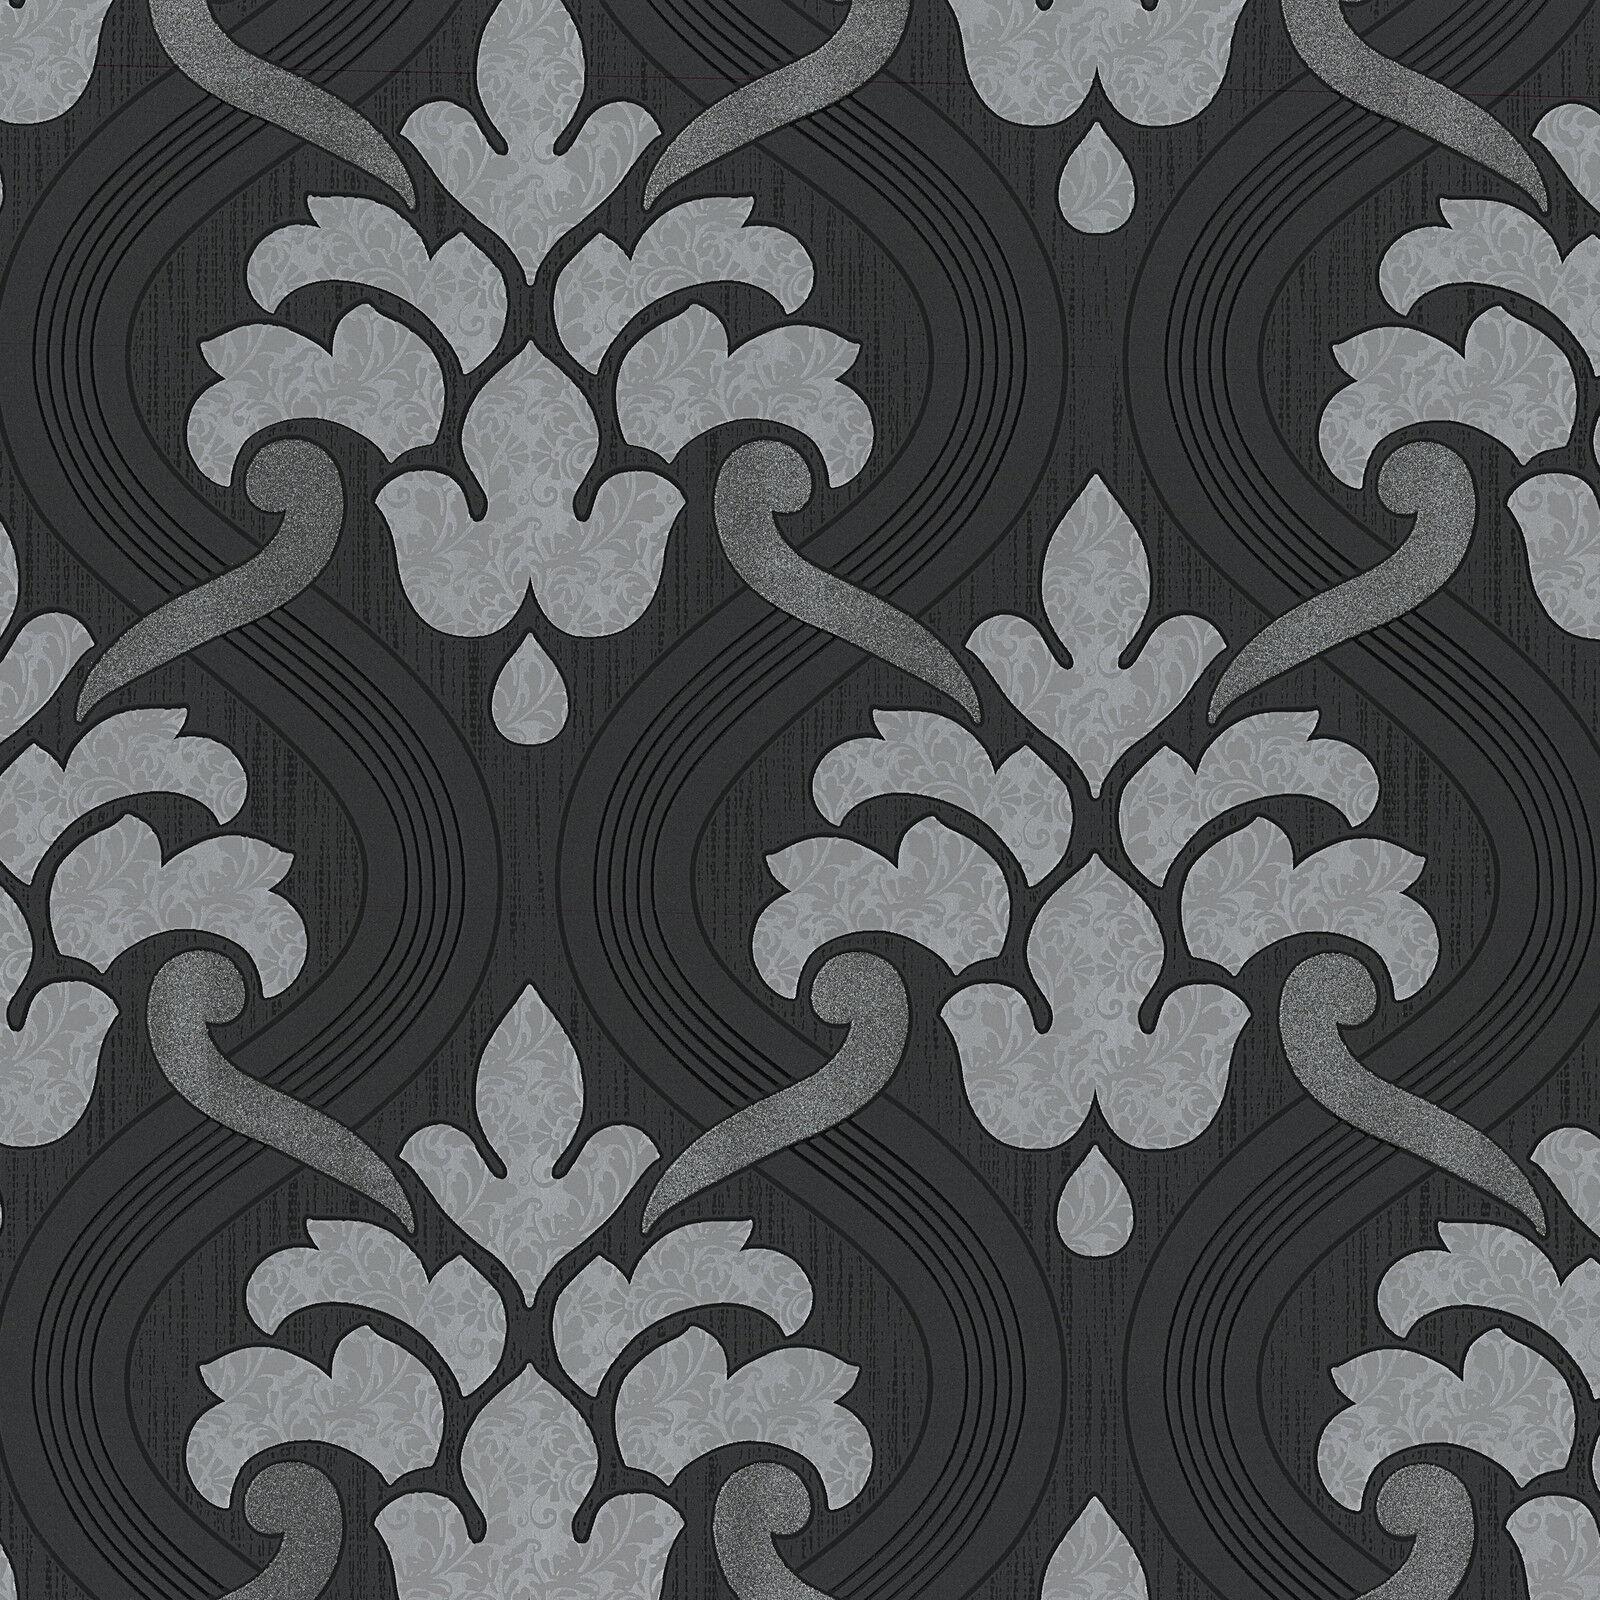 Vlies Tapete Barock Muster Ornament schwarz grau silber metallic ...